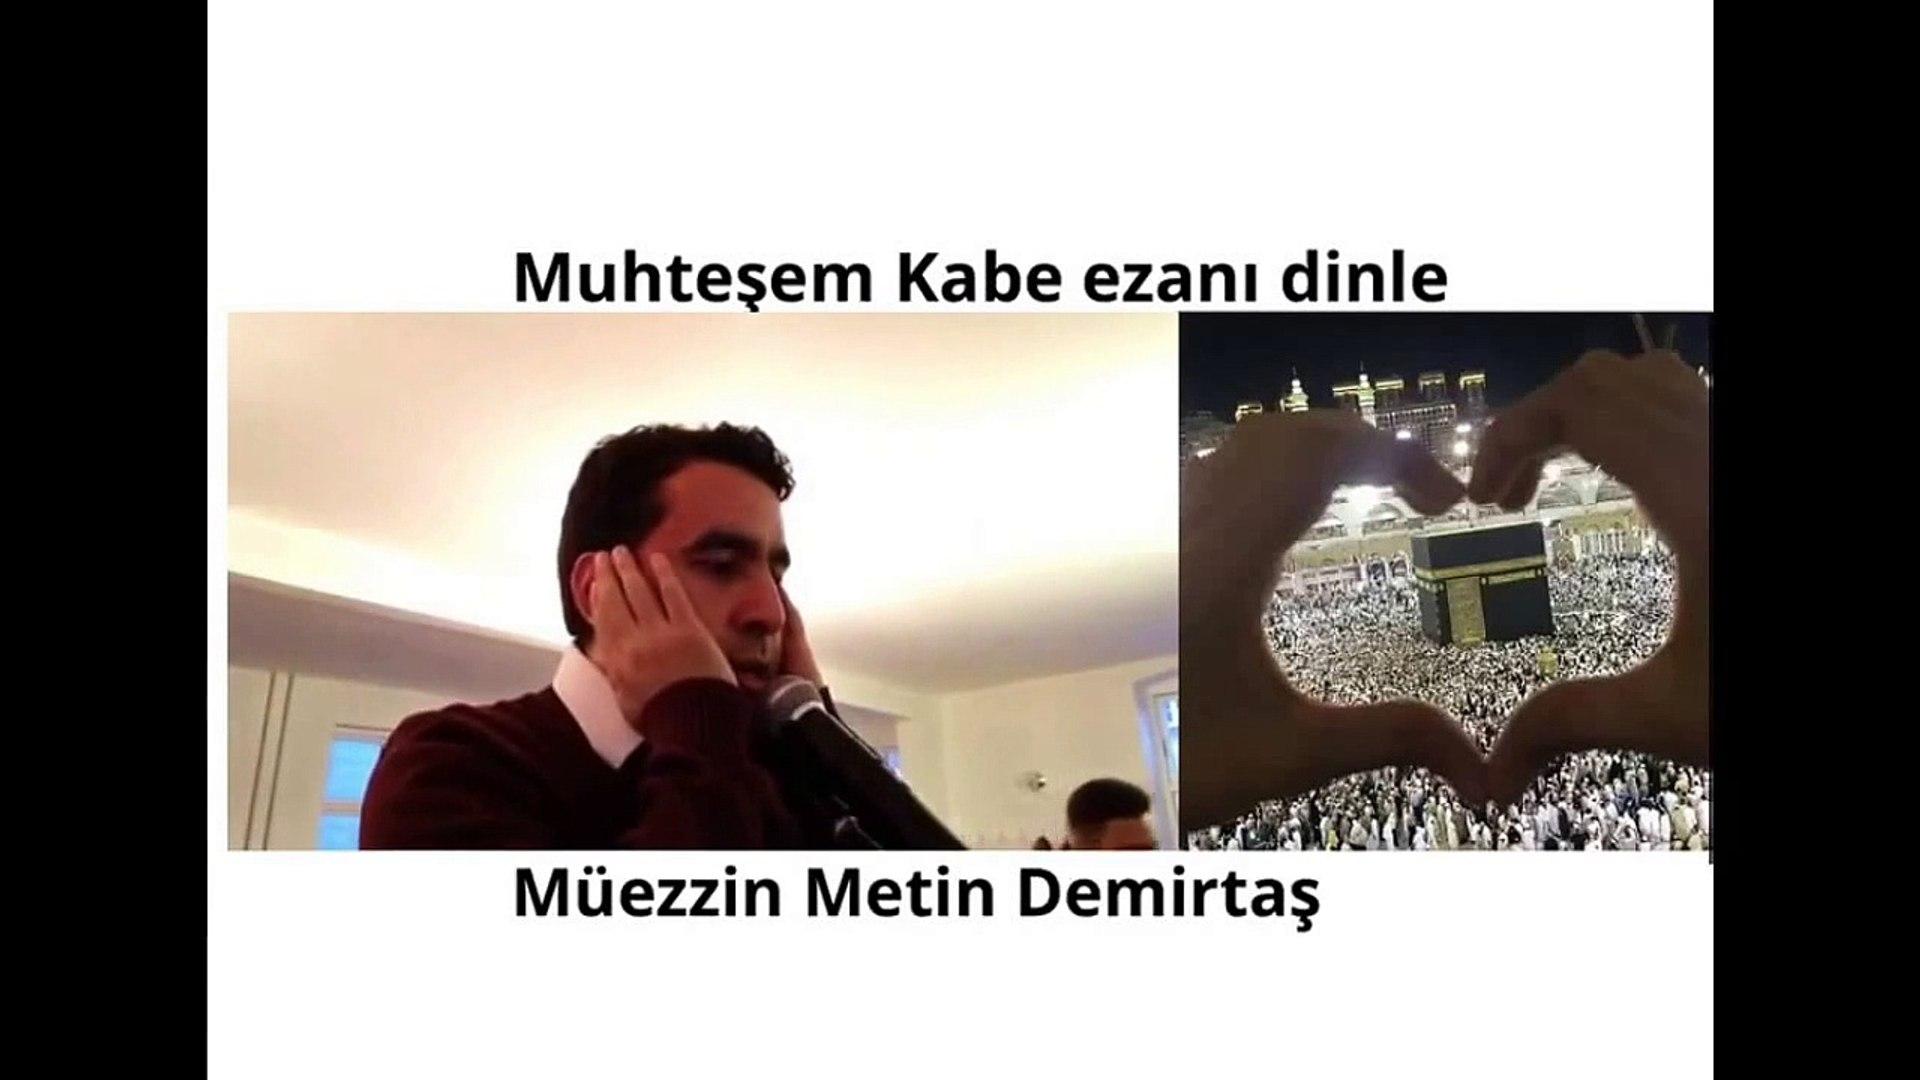 Metin Demirtas. Kabe ezani. Mescidi Haram da ezan. Azan Makkah Masjid Al Haram. Azan Sheikh Ali Mull